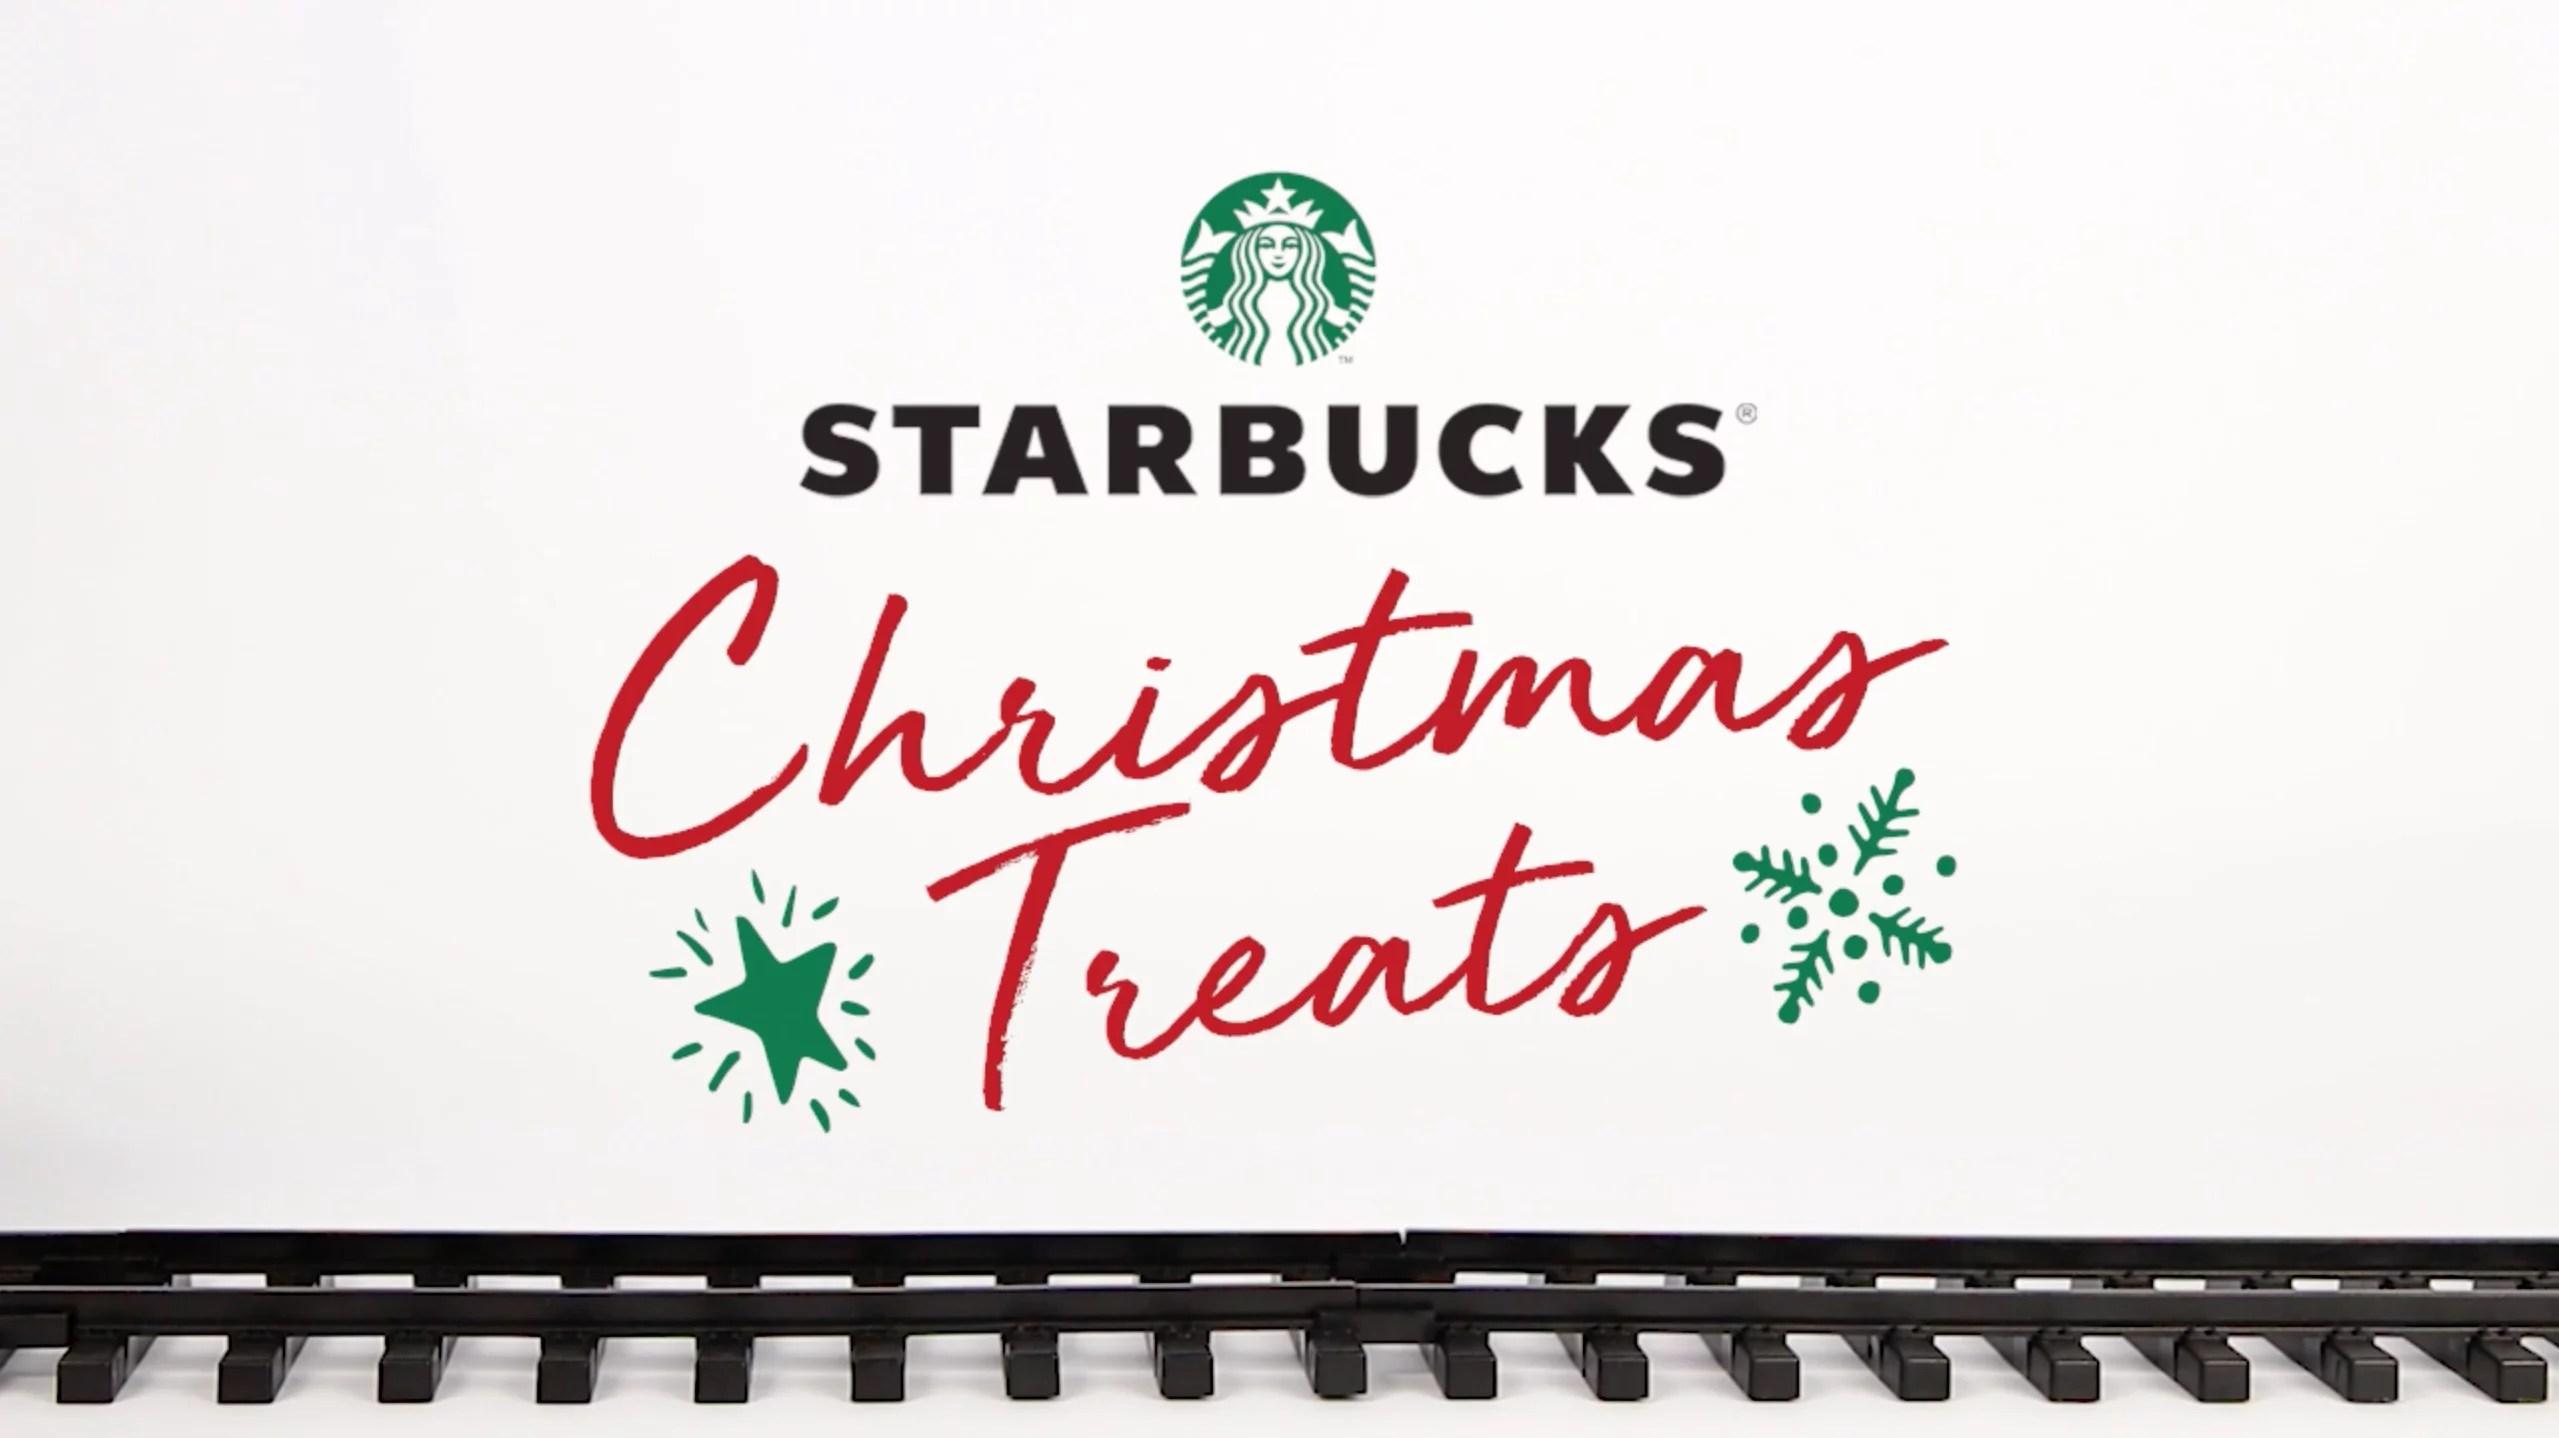 Starbucks Christmas Treats - BiteSized.ph